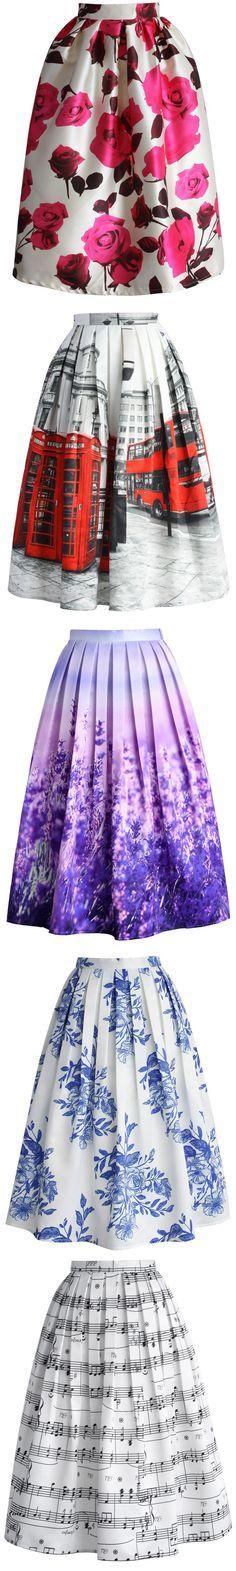 floral skirt, scenic print midi skirt collection